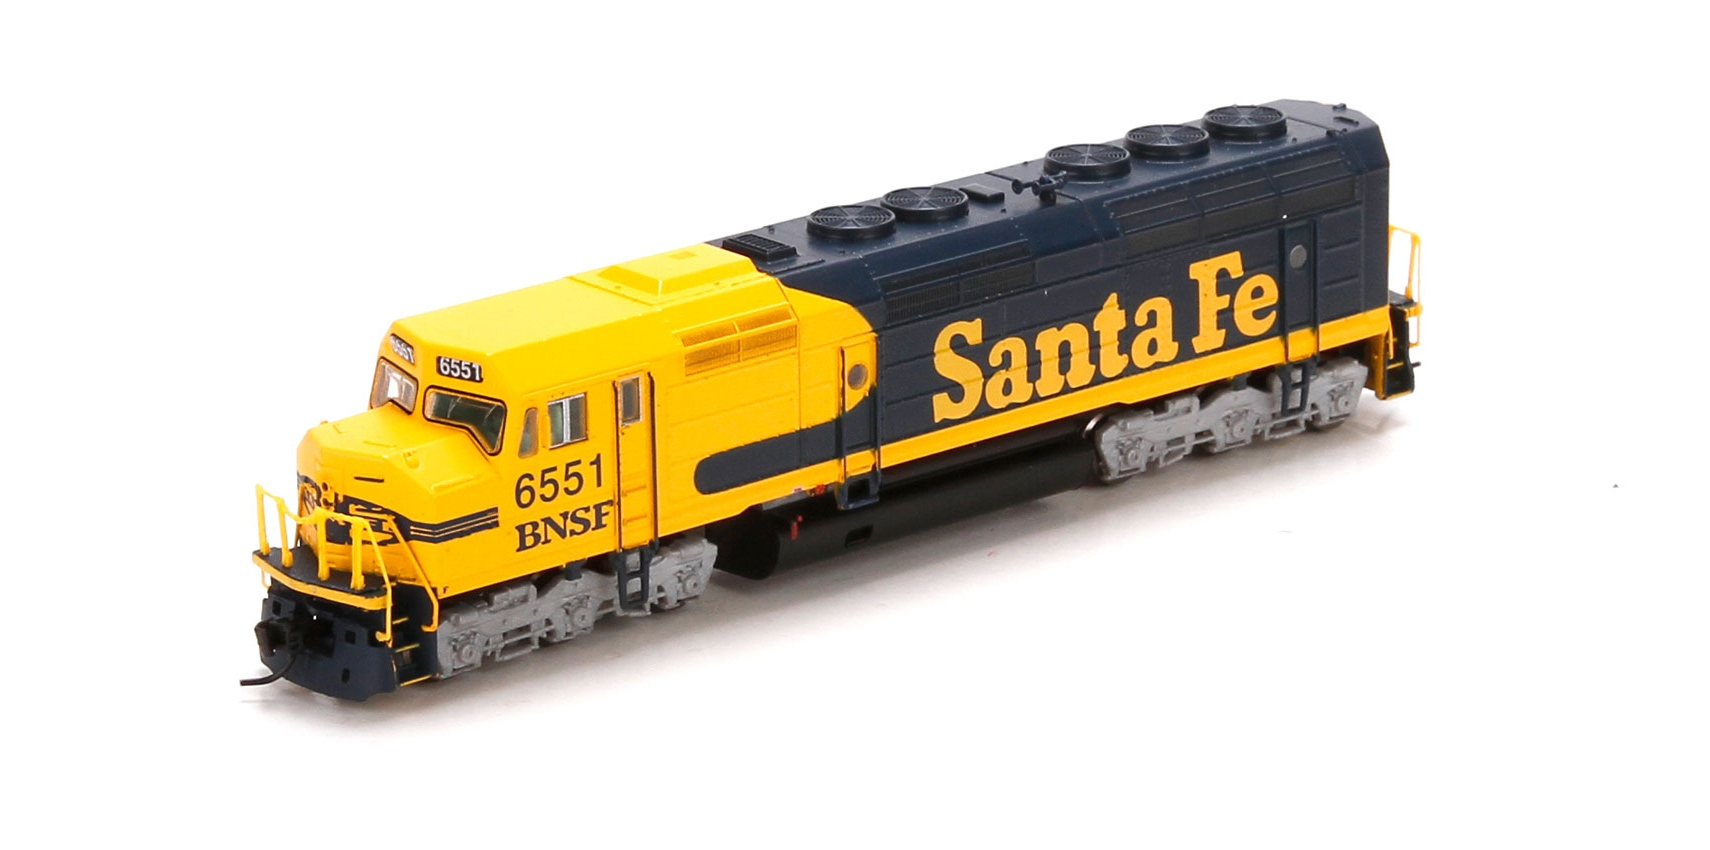 N Scale - Athearn - 22433 - Locomotive, Diesel, EMD F45 - Burlington Northern Santa Fe - 6551